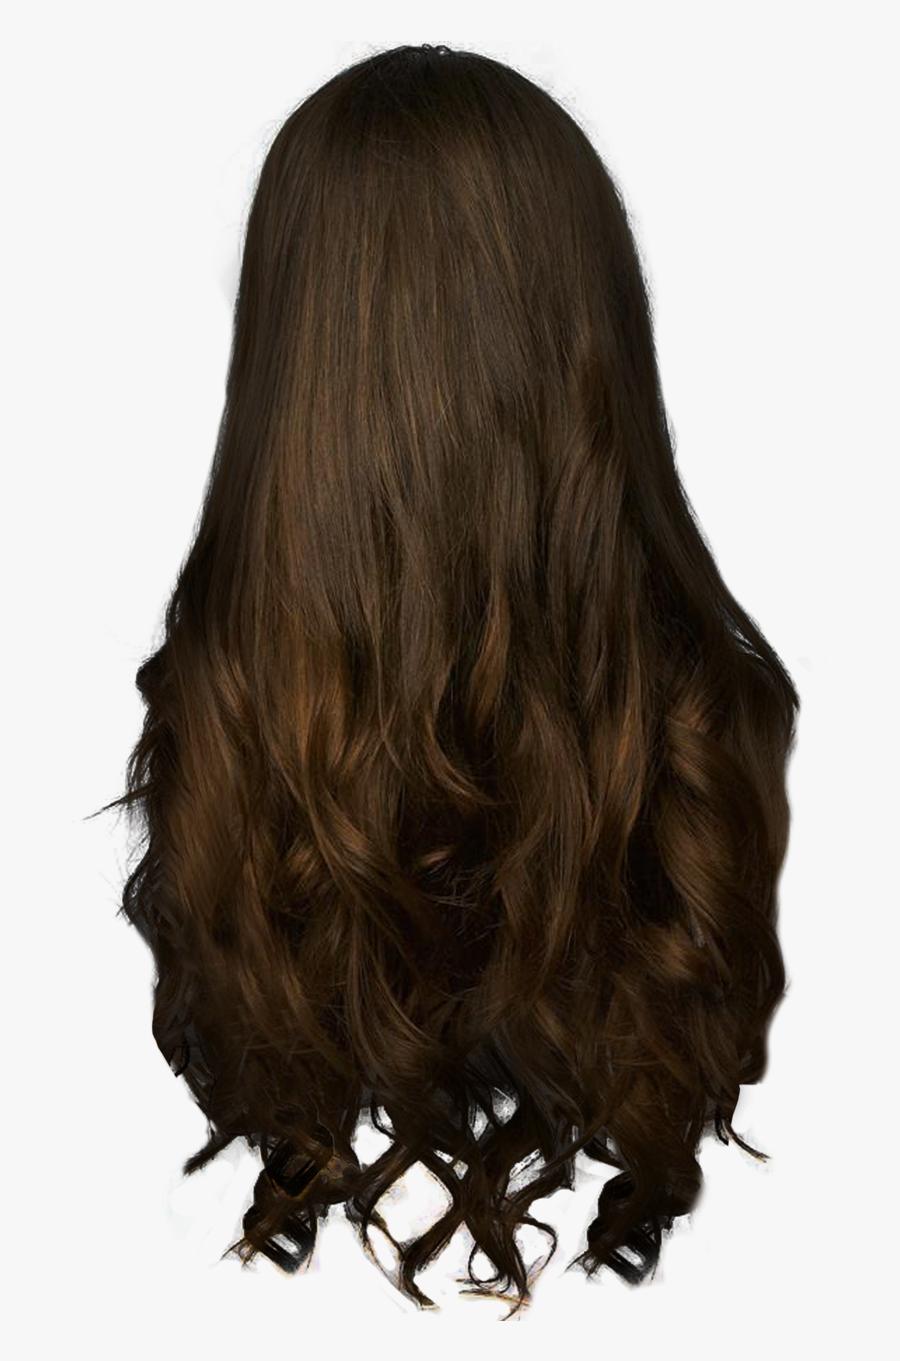 Long Brown Hair Clipart - Women Hair Back Png, Transparent Clipart